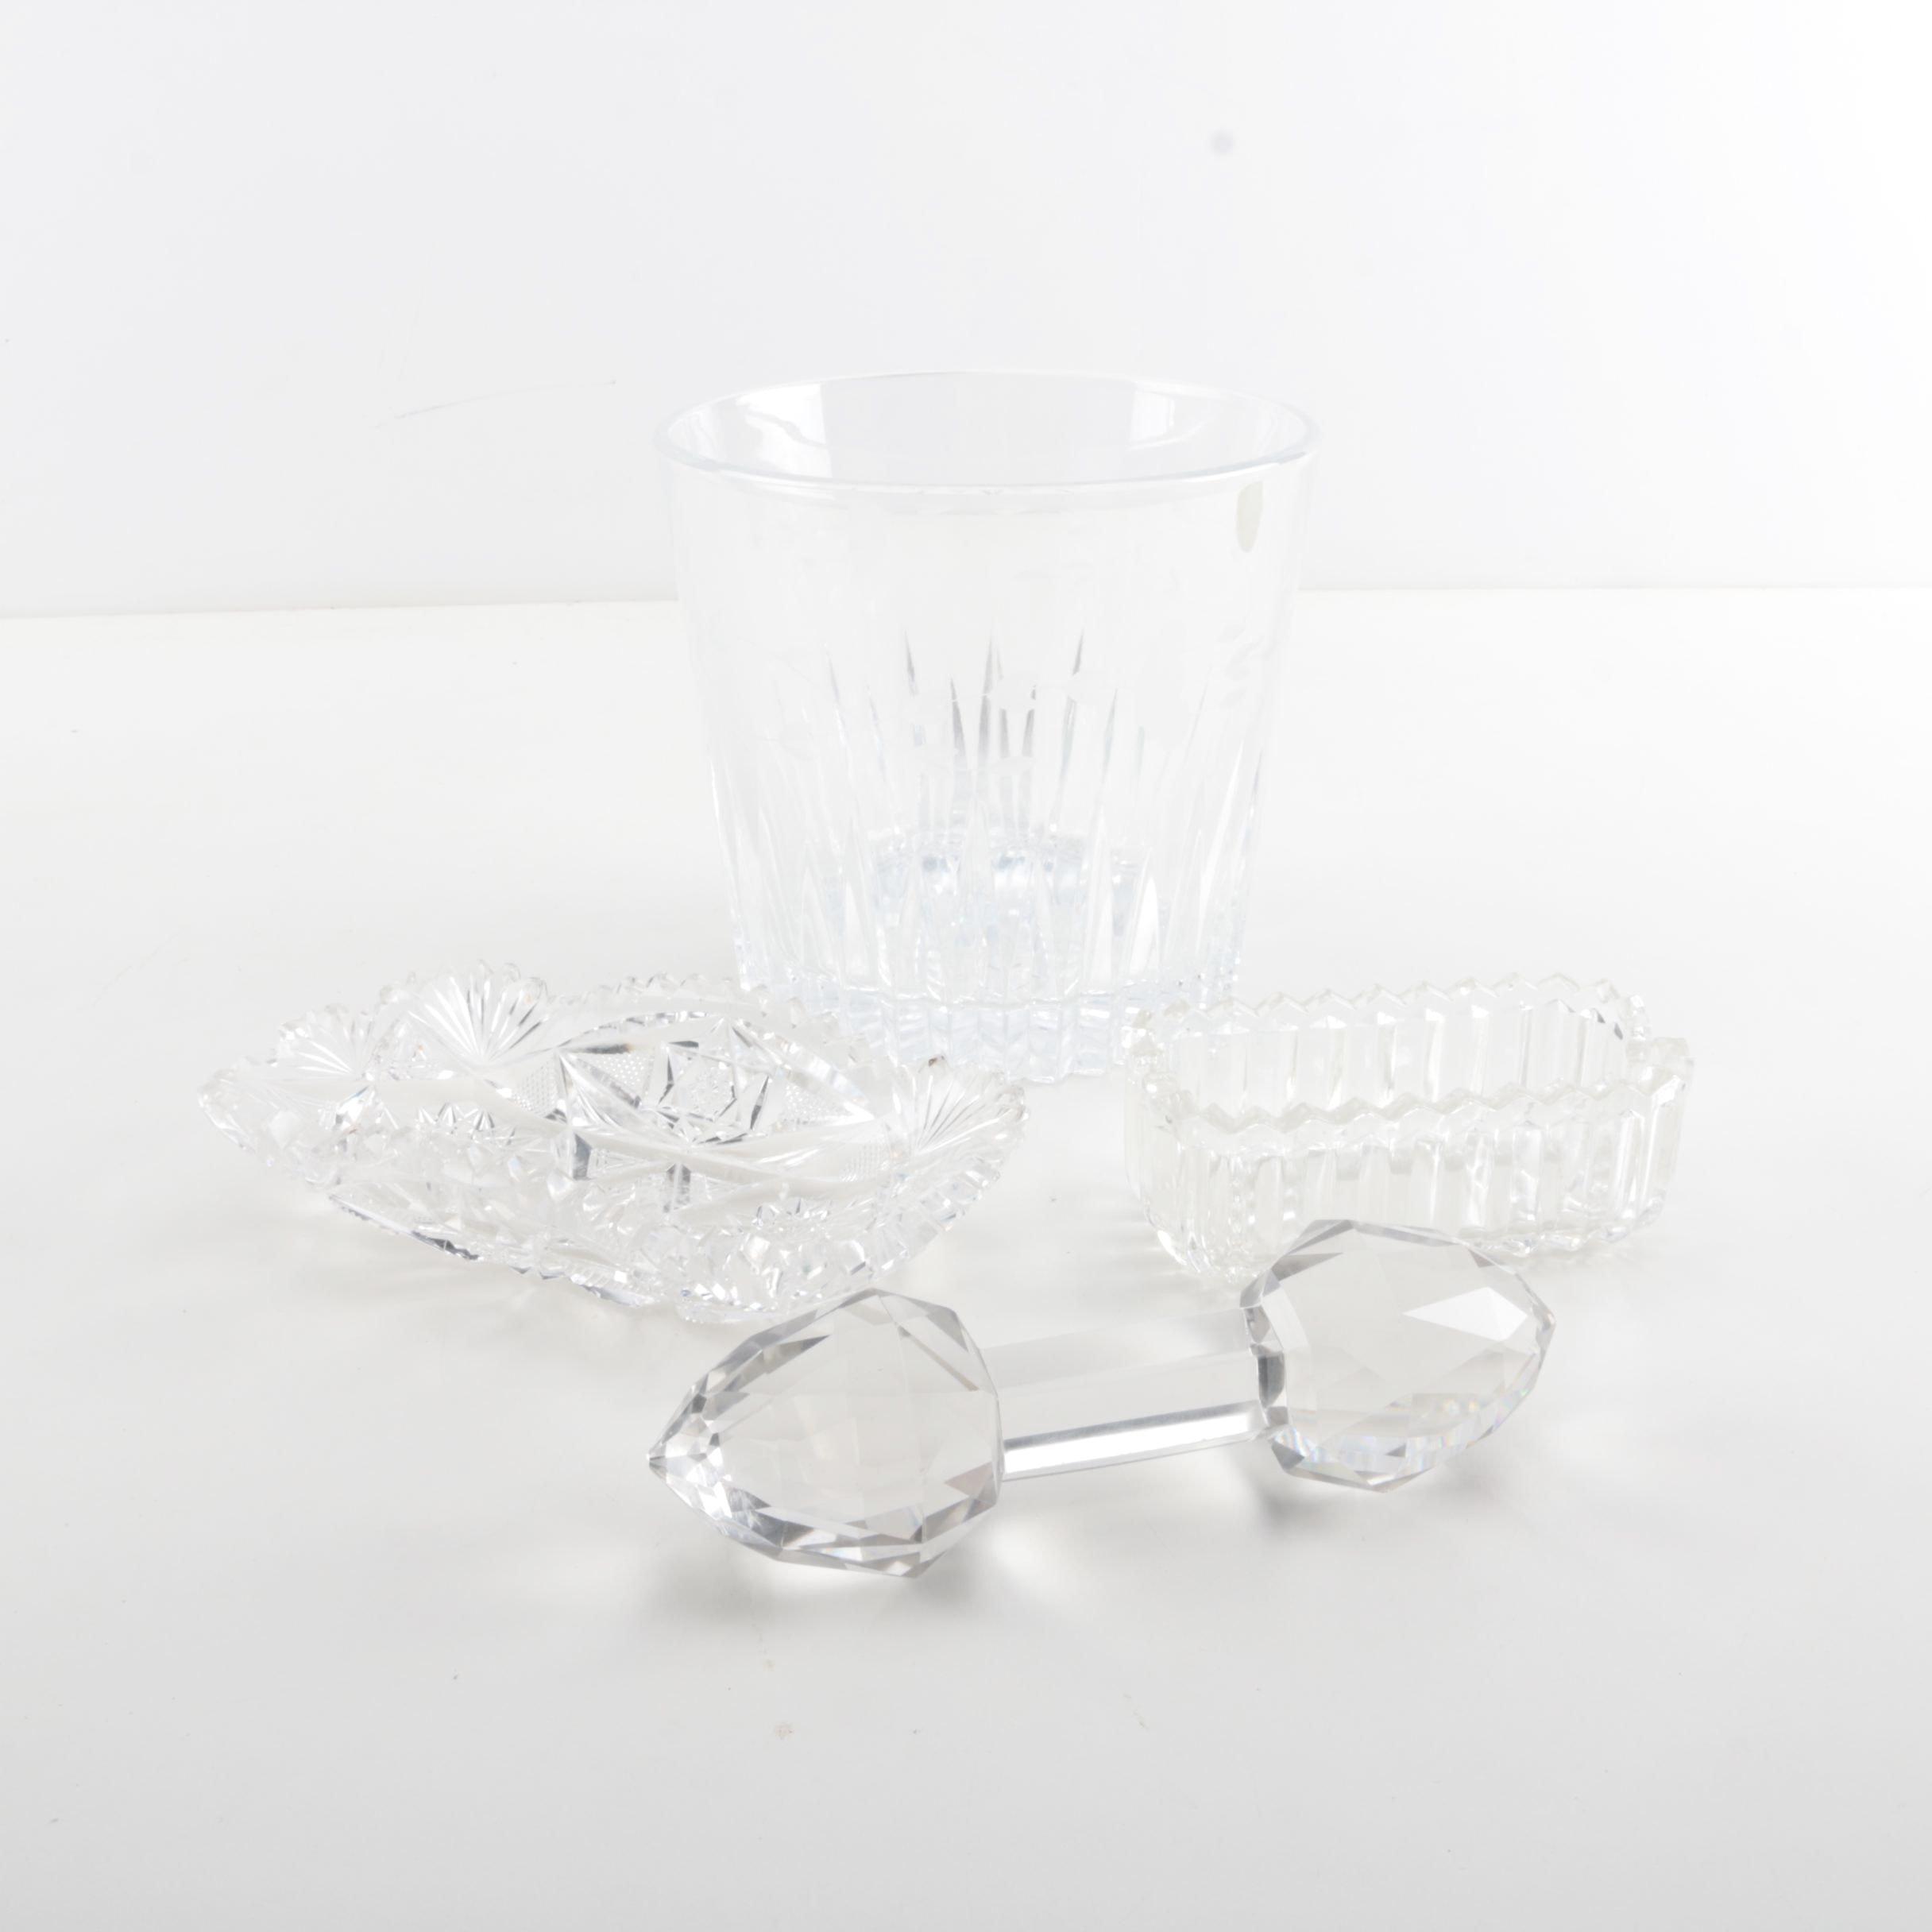 Crystal Ice Bucket and Decor